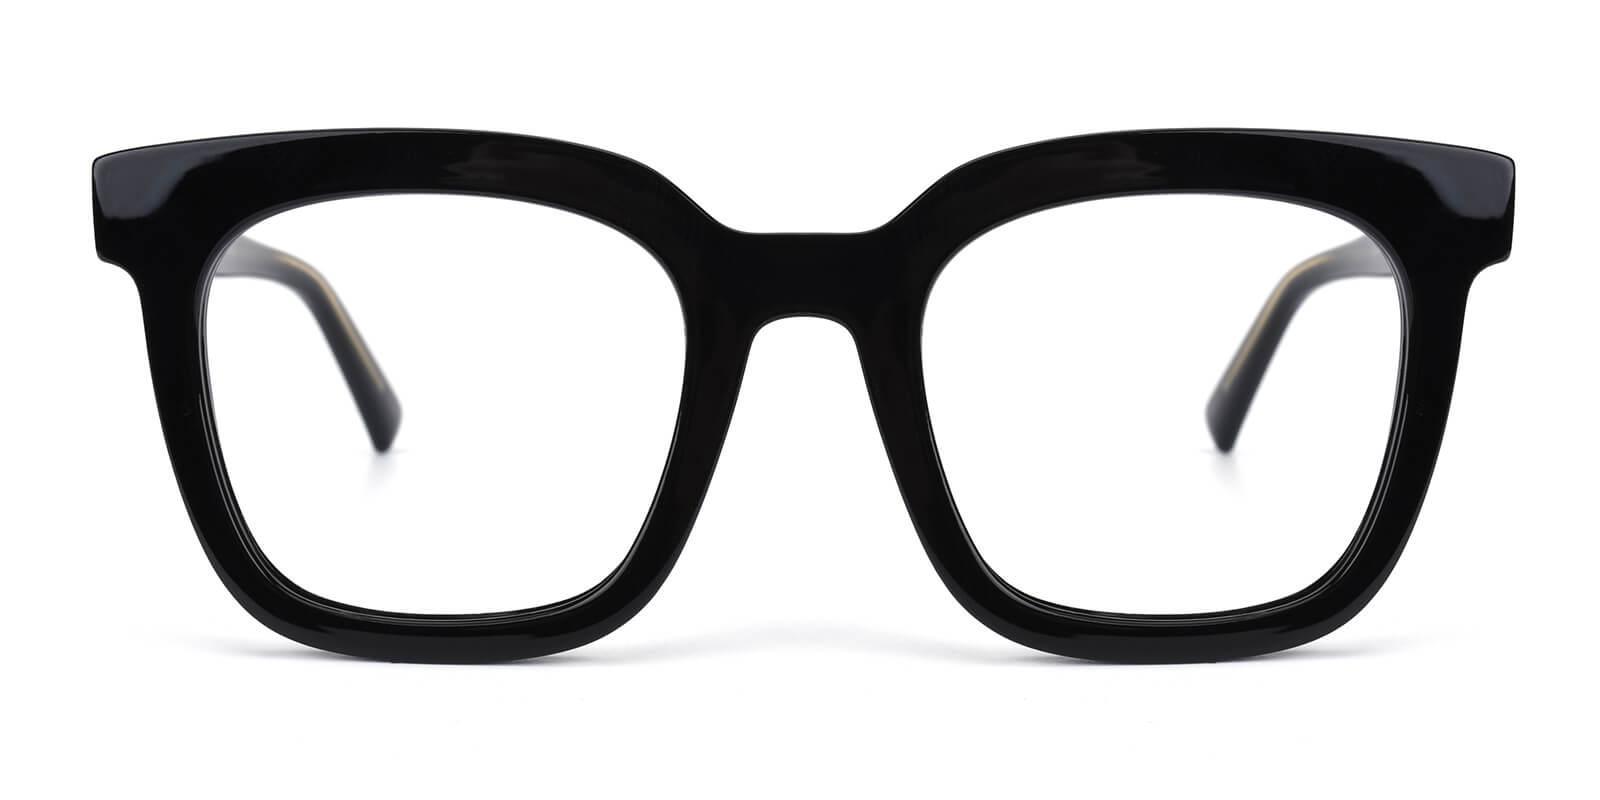 Vienna-Black-Square-Acetate-Eyeglasses-additional2